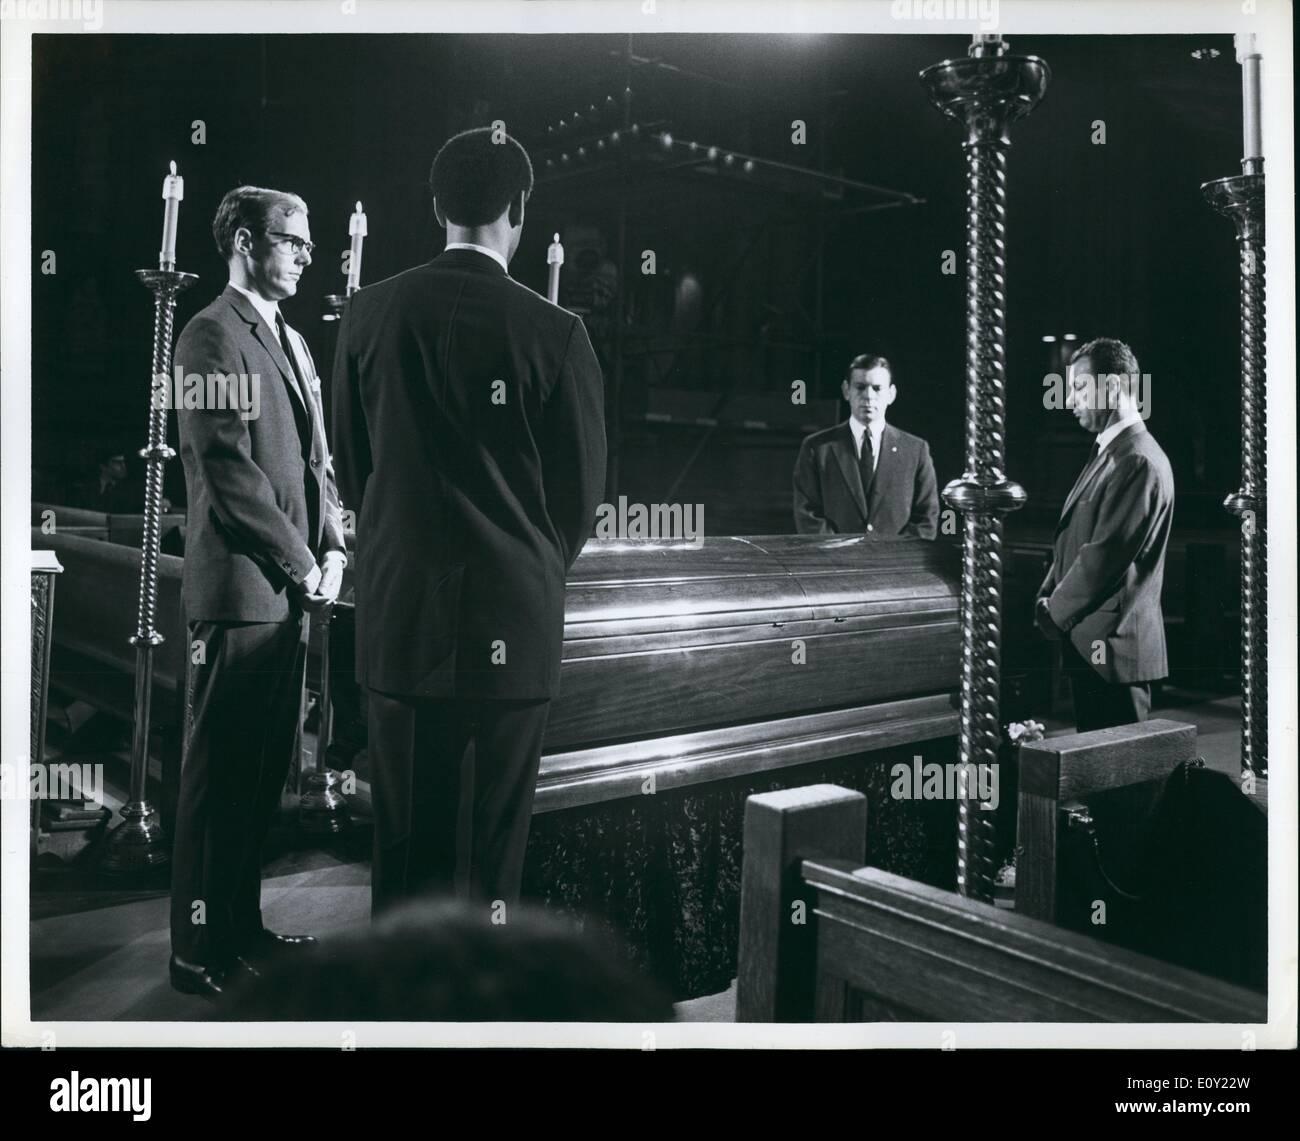 Jun. 06, 1968 - Night vigil at Robert F. Kennedy's casket at St. Patricks Cathedral, New York, June 7, 1968, - Stock Image